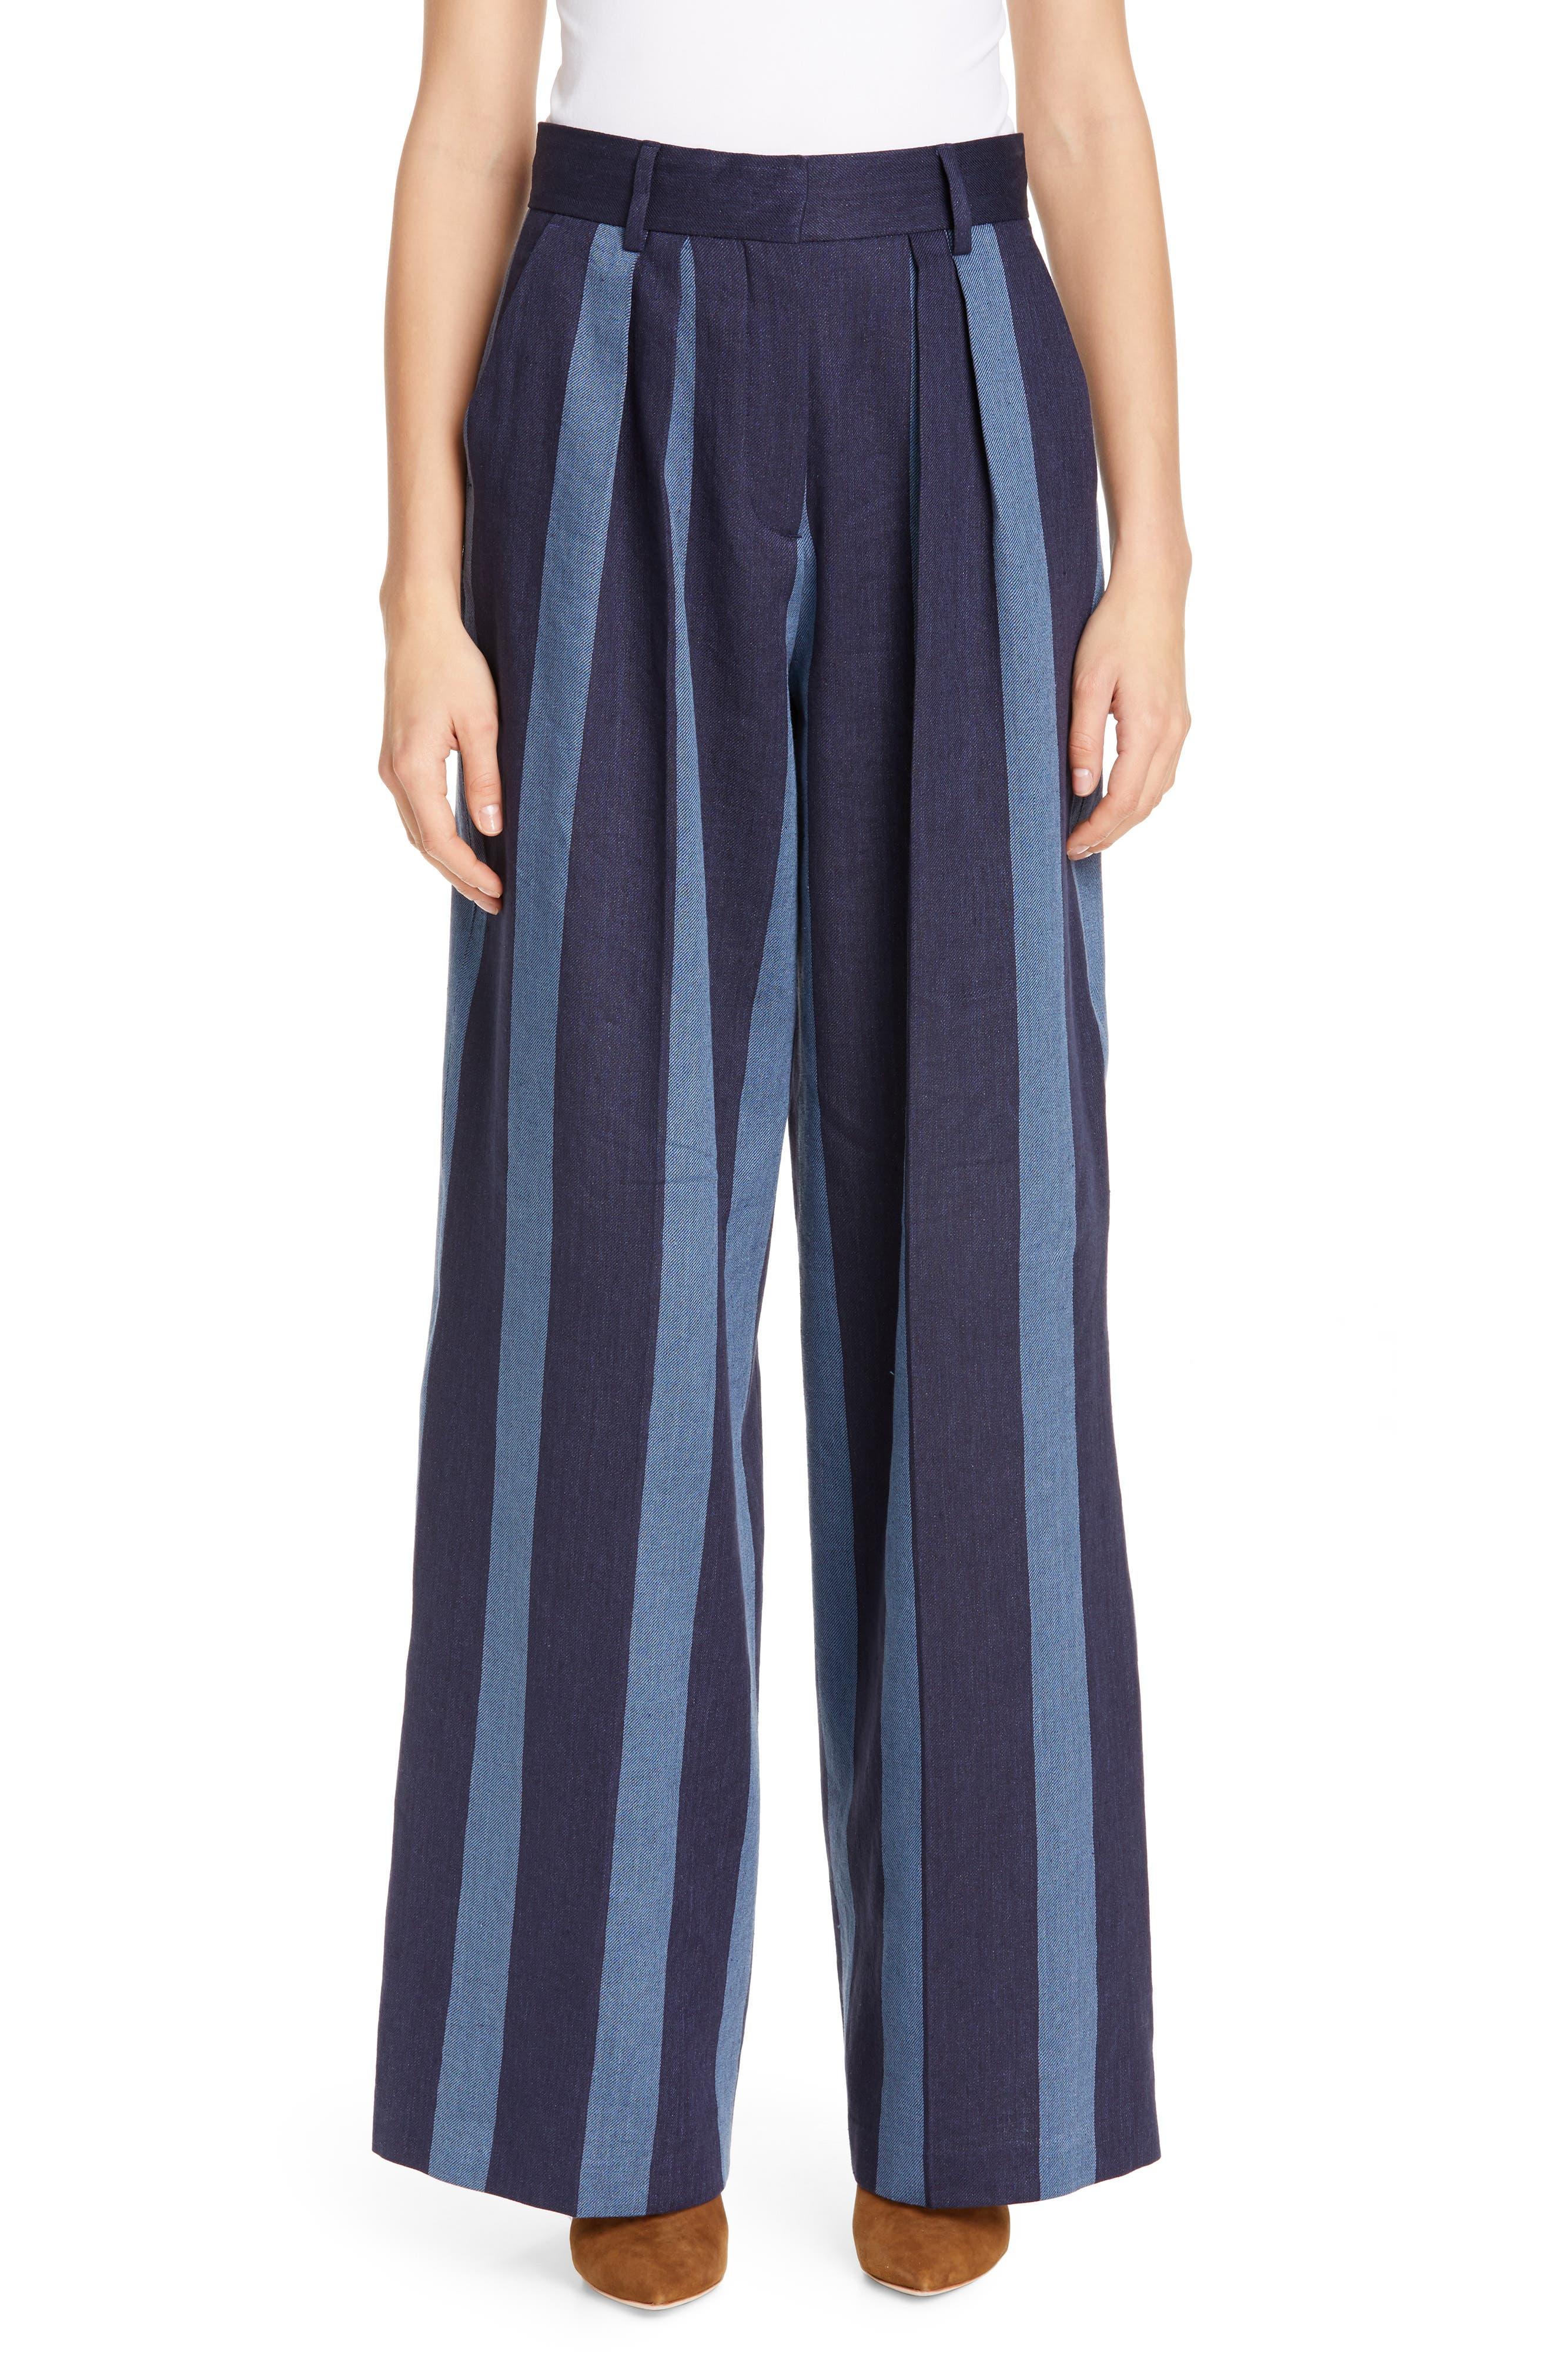 TOMMY X ZENDAYA Stripe Denim Pants, Main, color, STRIPED DENIM